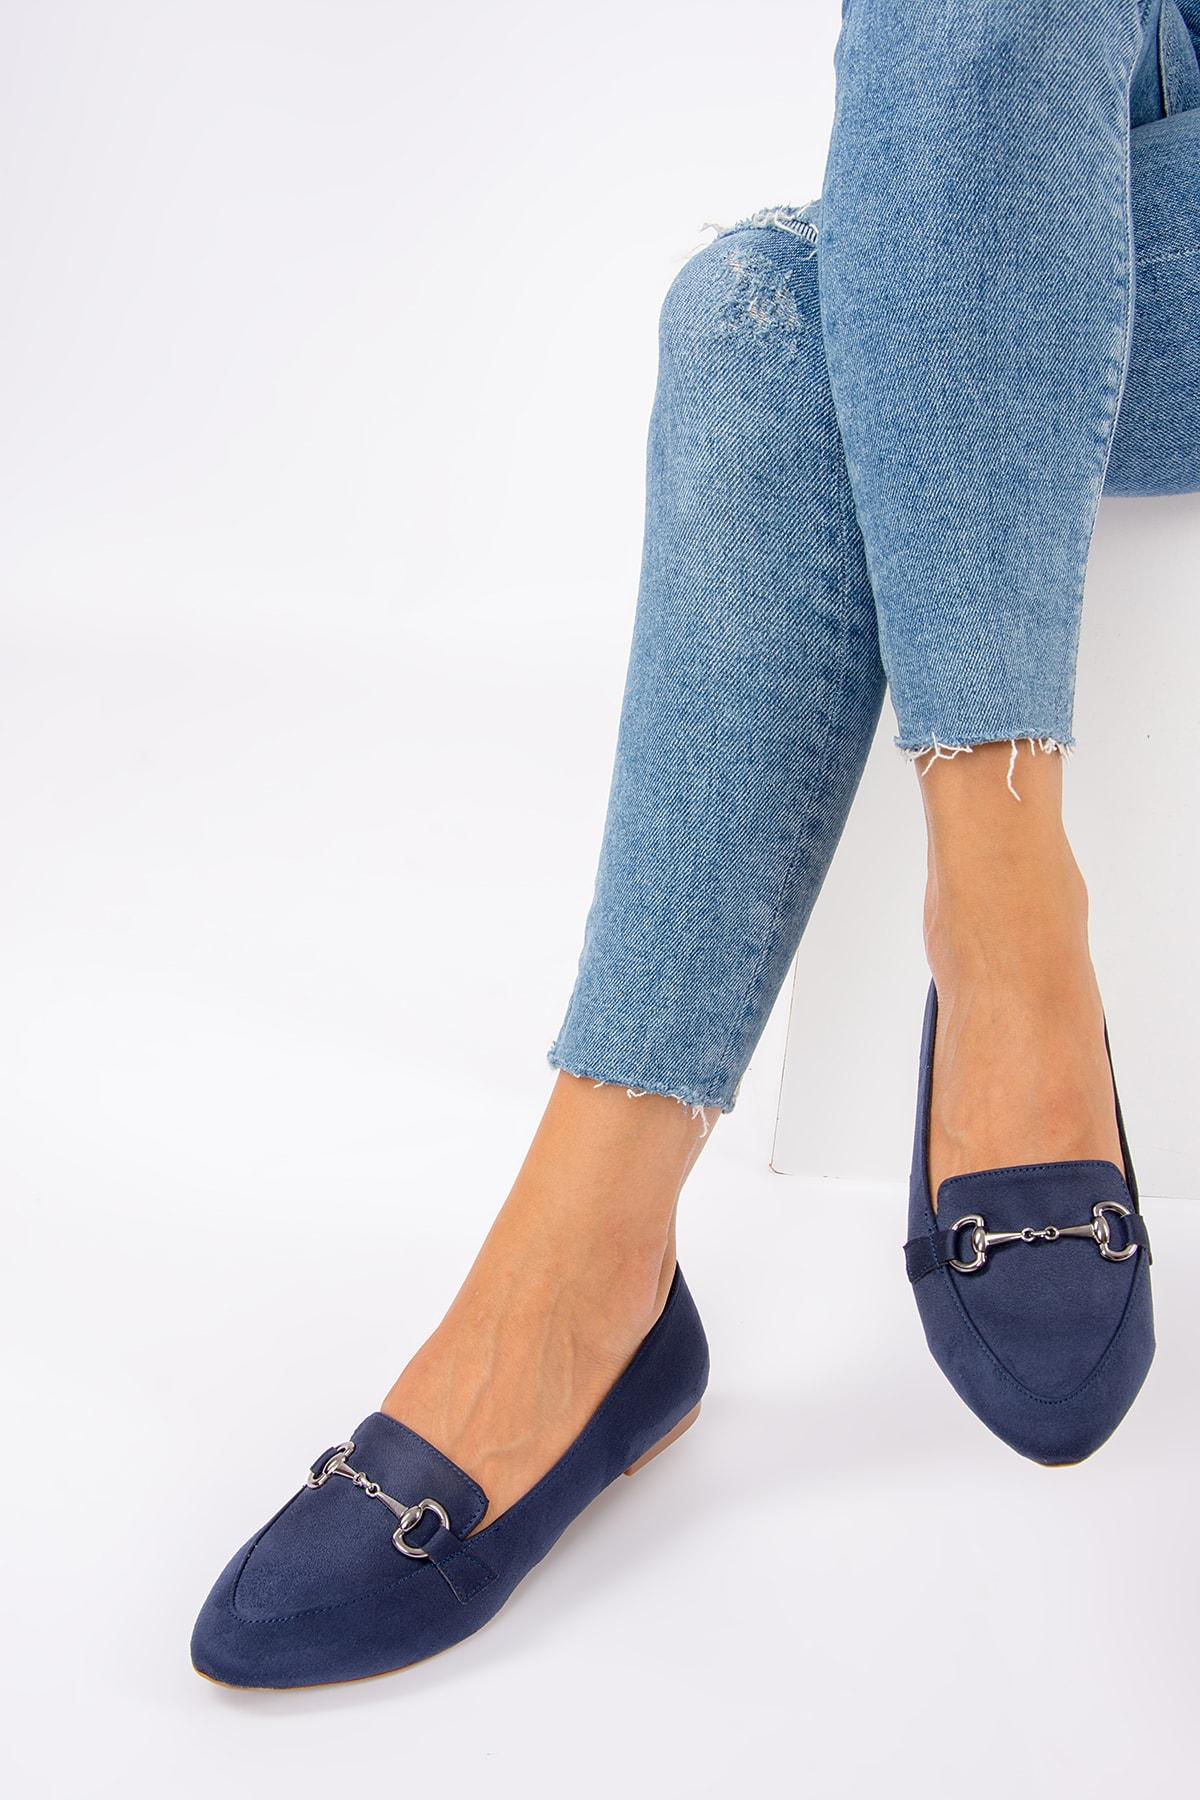 Fox Shoes Lacivert Kadın Babet G290010002 1